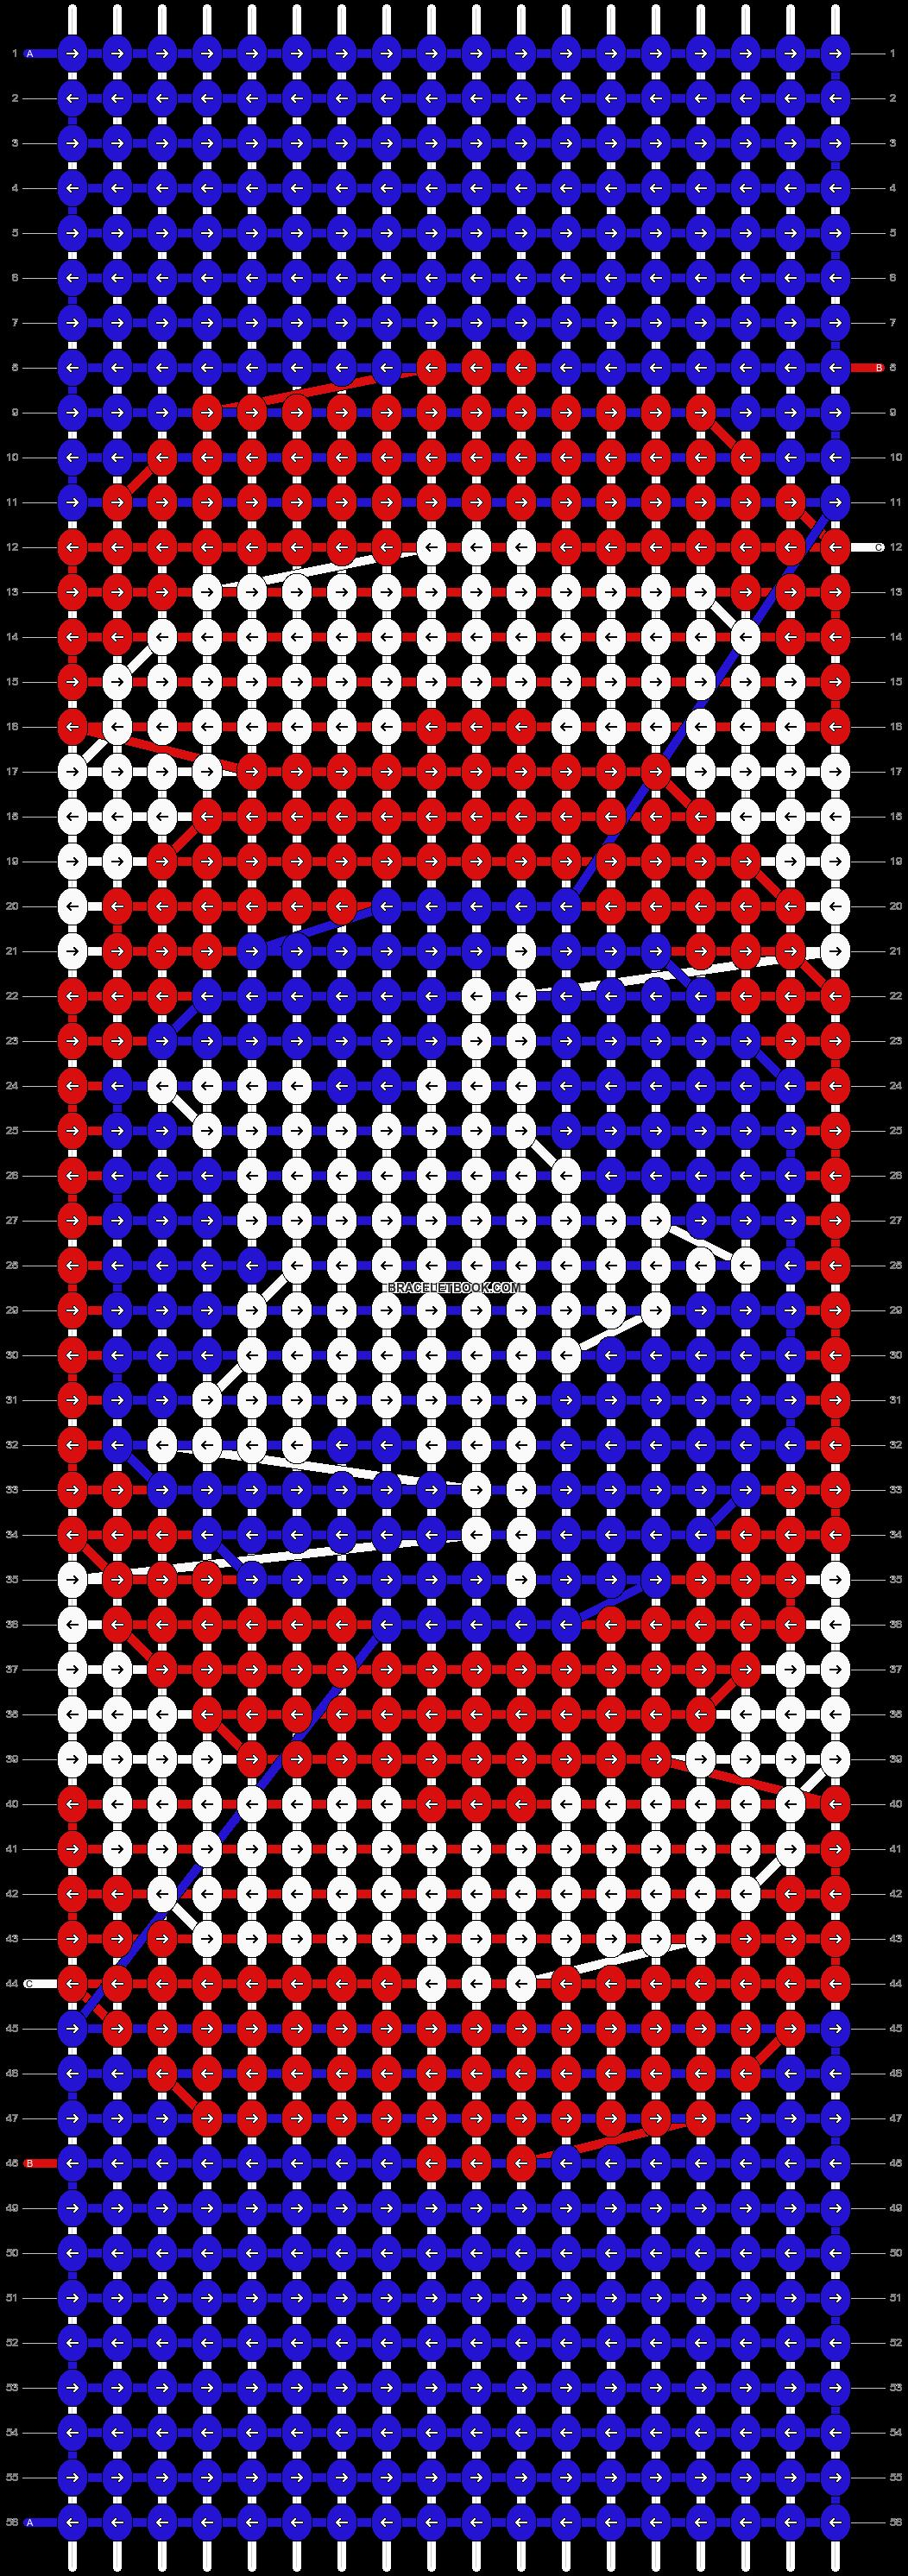 Alpha Pattern #13233 added by Kass1822